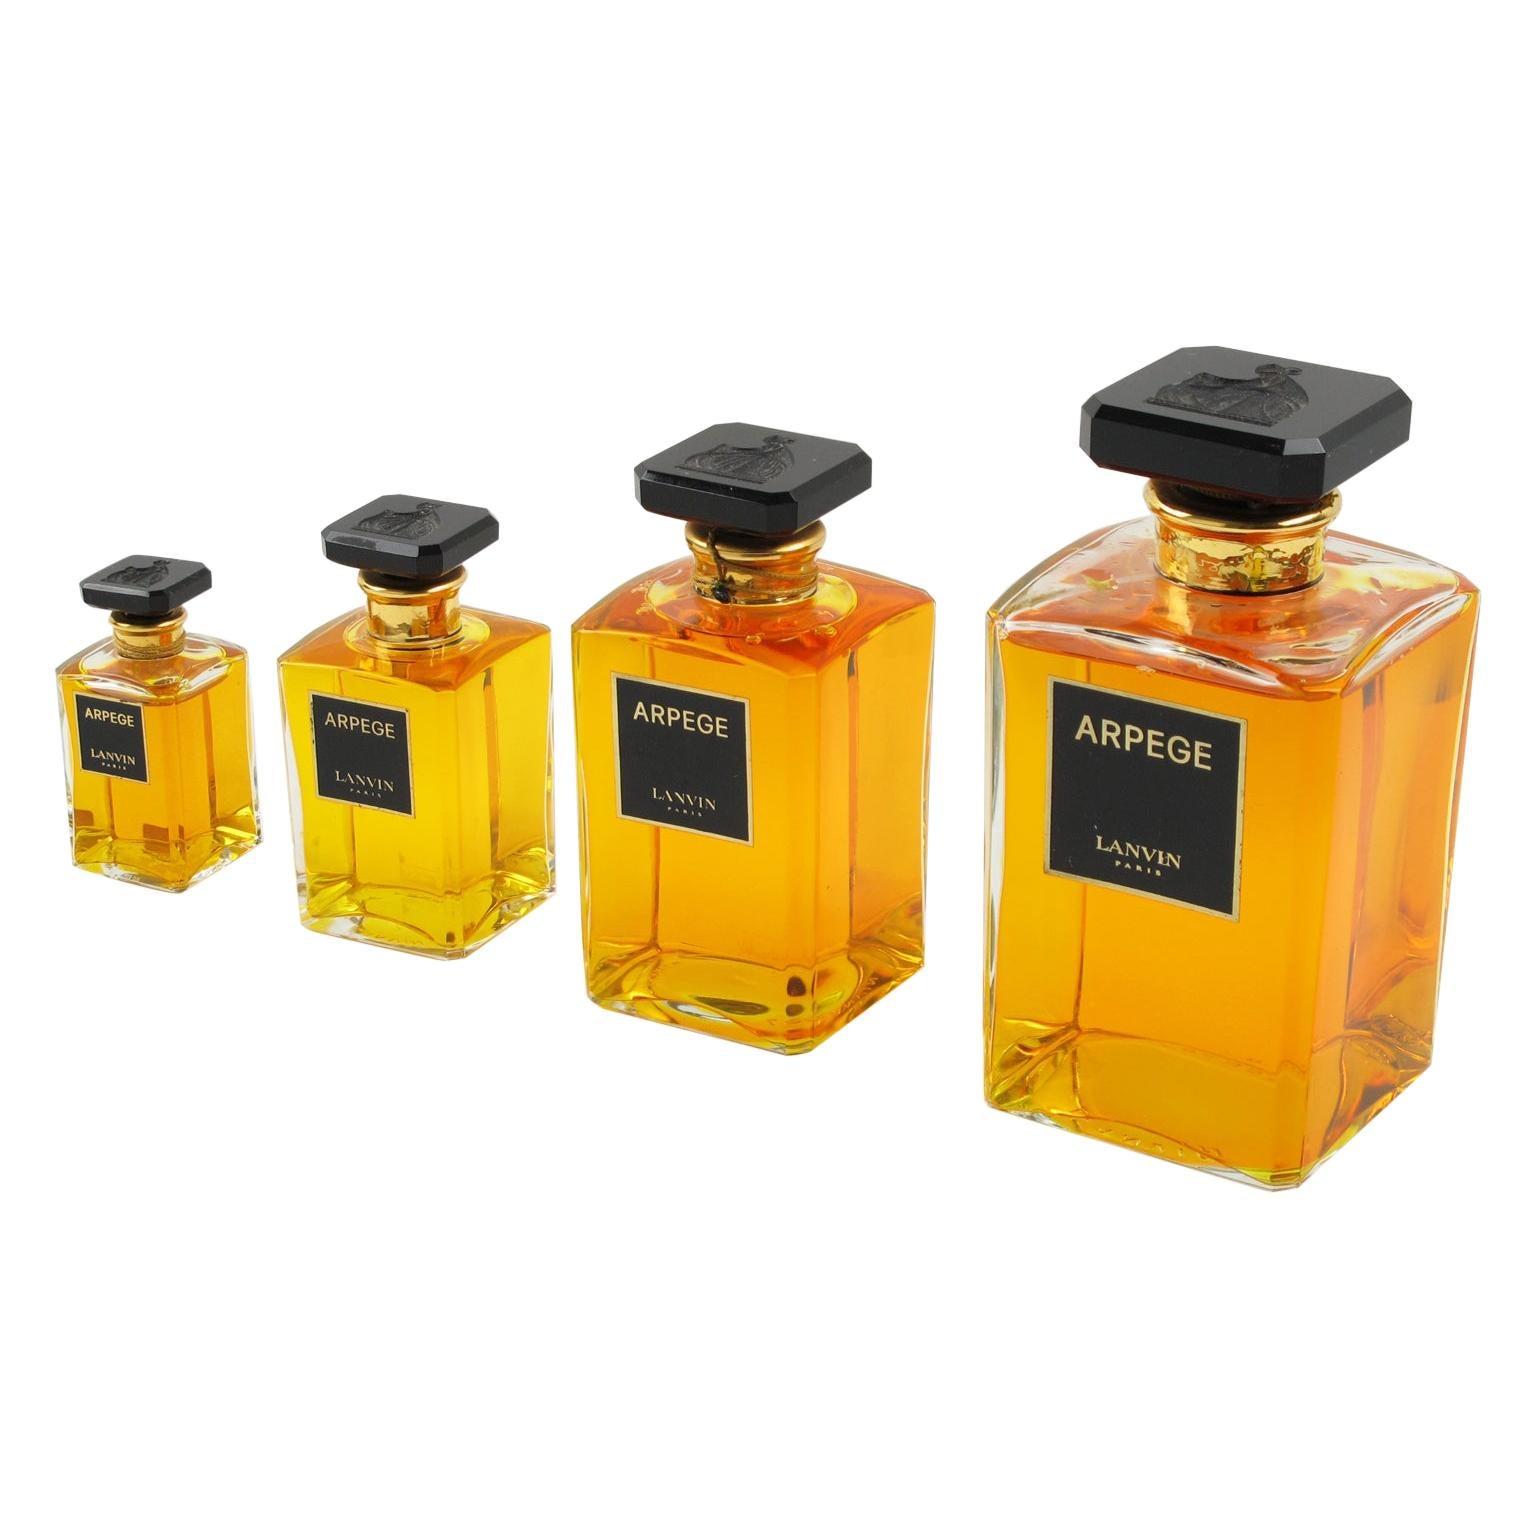 Lanvin Arpege Store Display Factice Crystal Perfume Bottle, 4 pieces